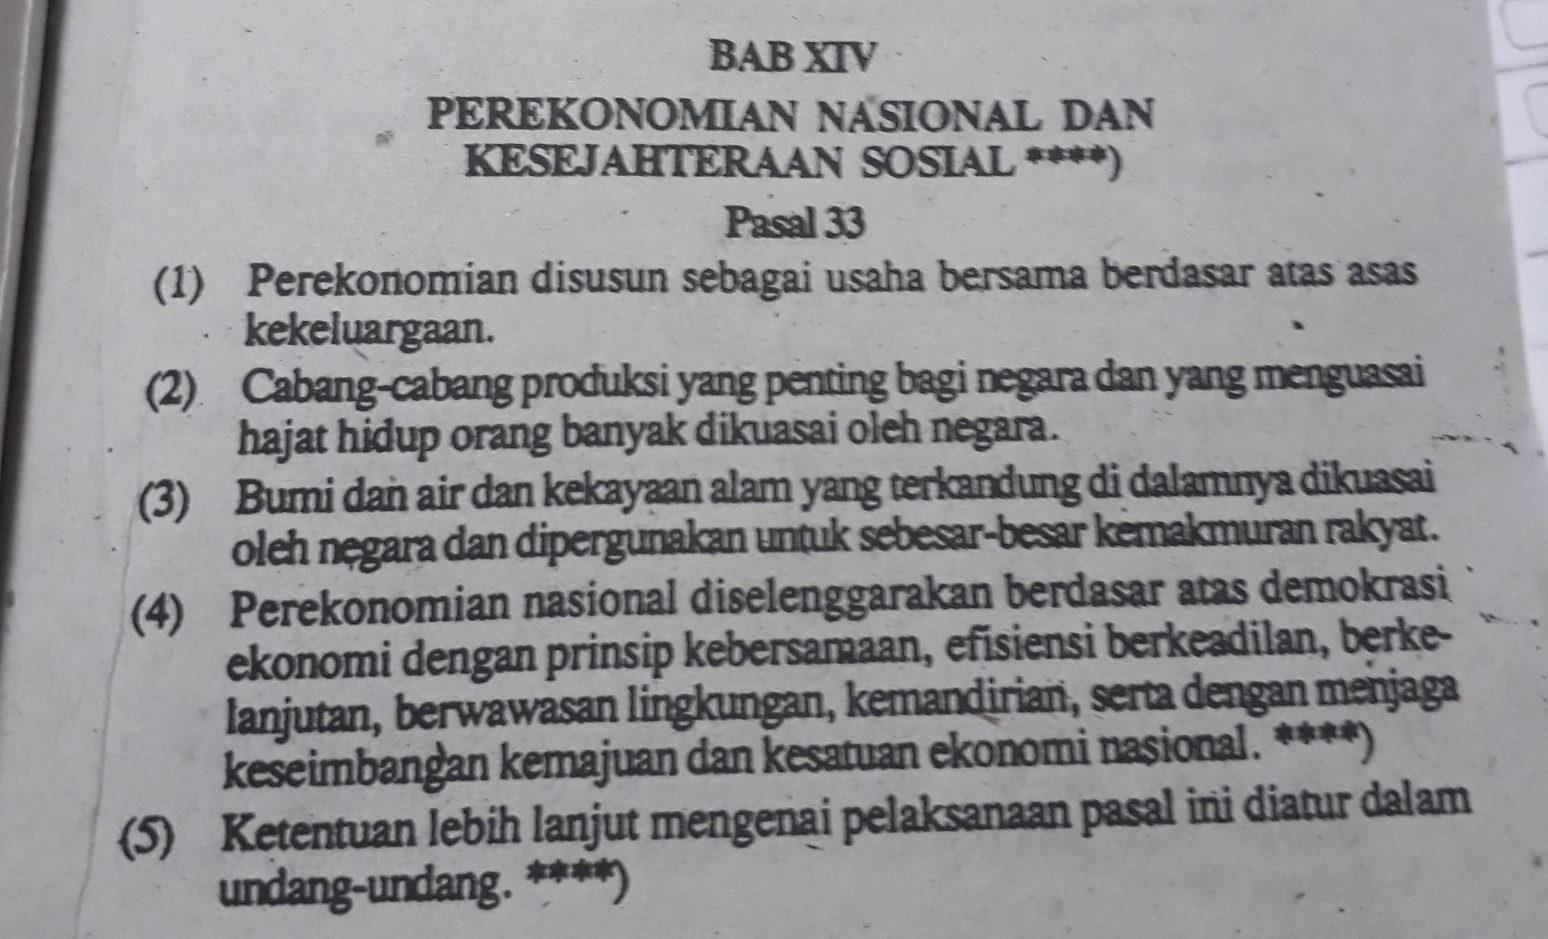 Adanya koperasi merupakan pelaksanaan UUD 1945 pasal33,ayat